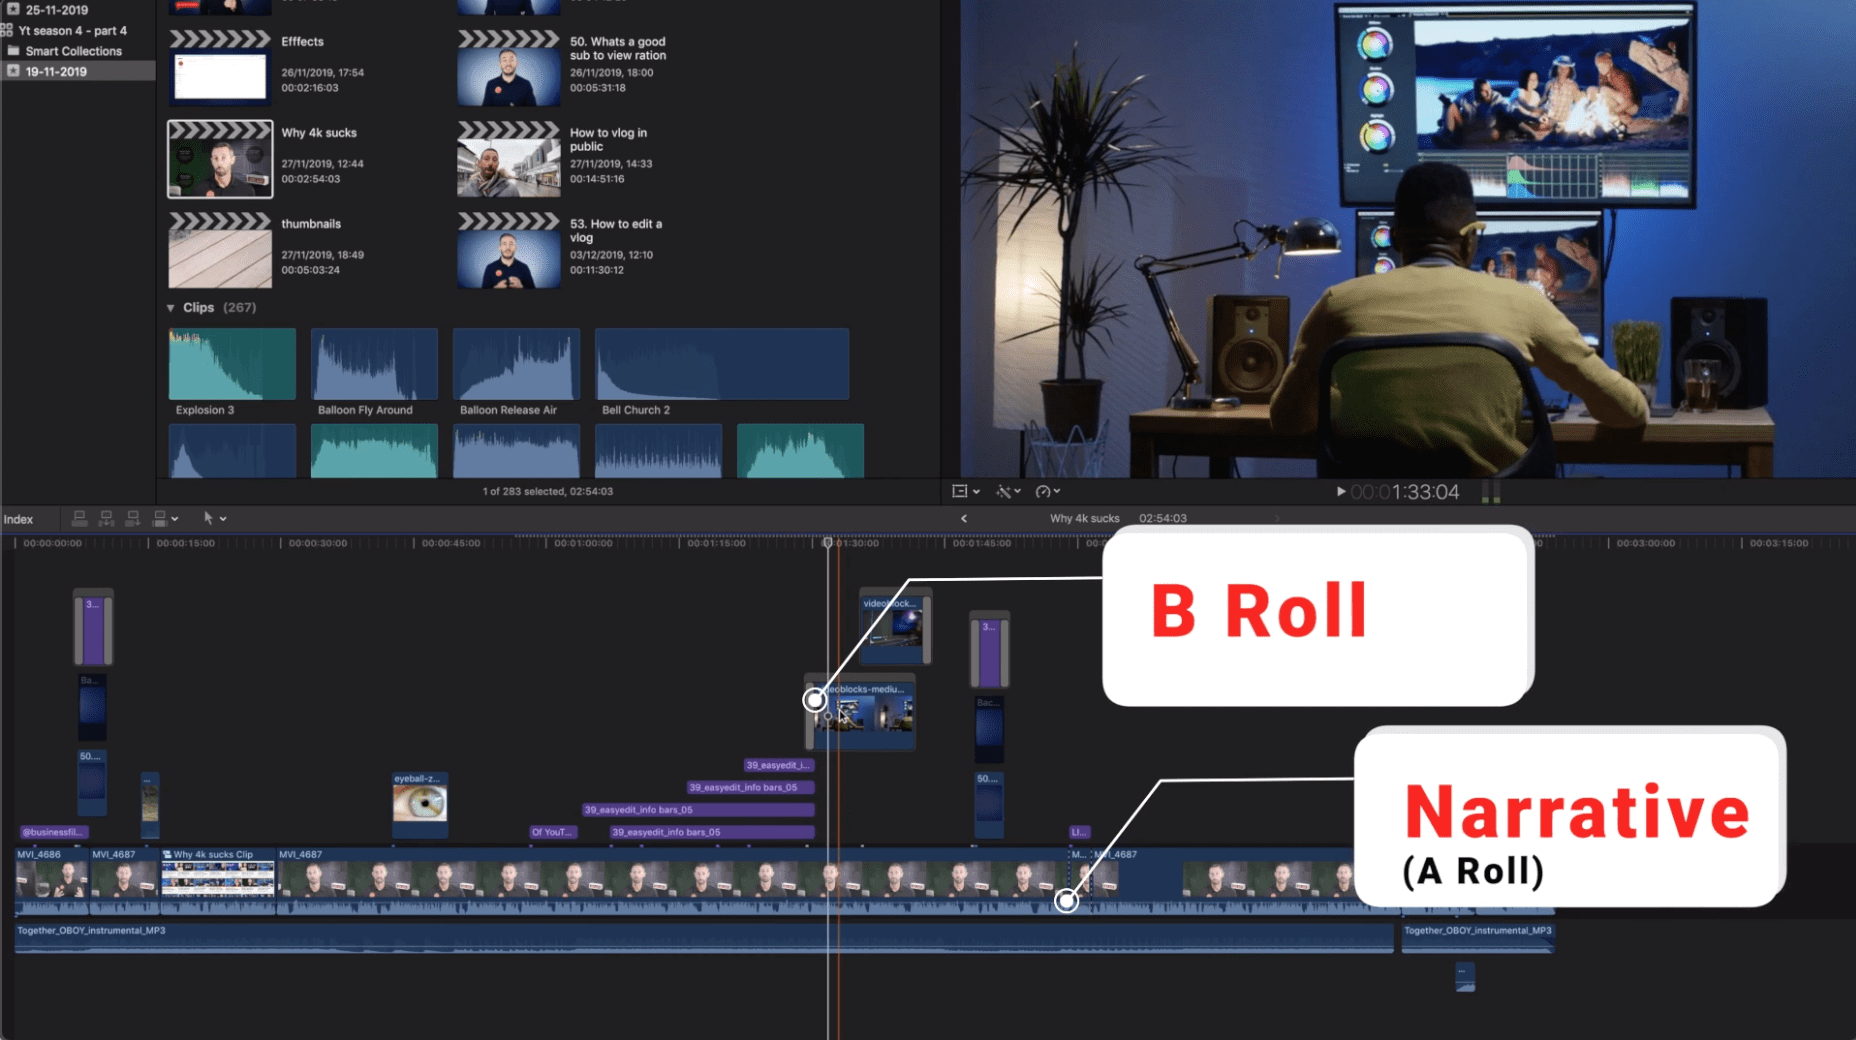 Adding b-roll to an edit